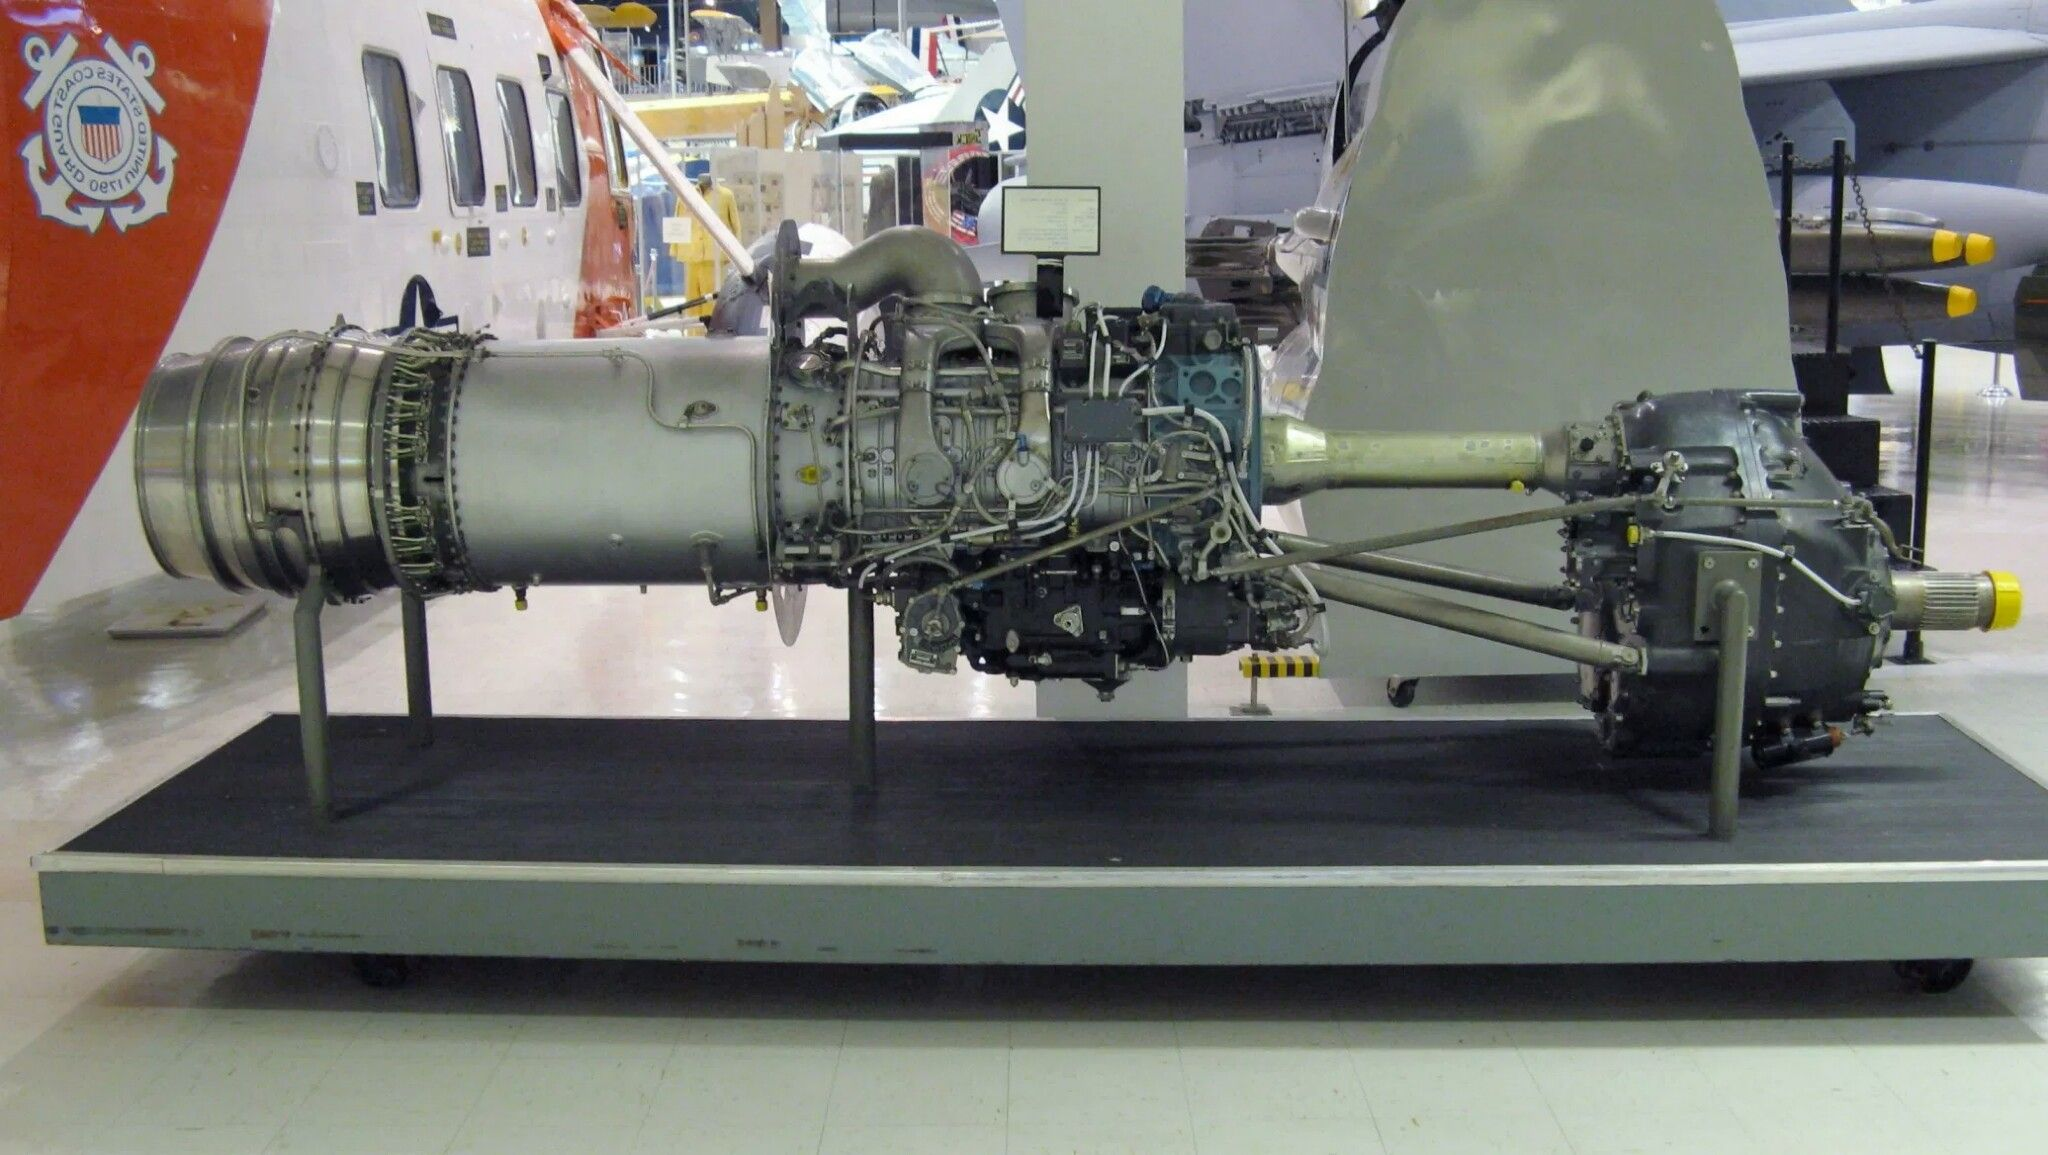 p3 orion t56 14 turbine engine with propeller gearbox nasb rh pinterest com